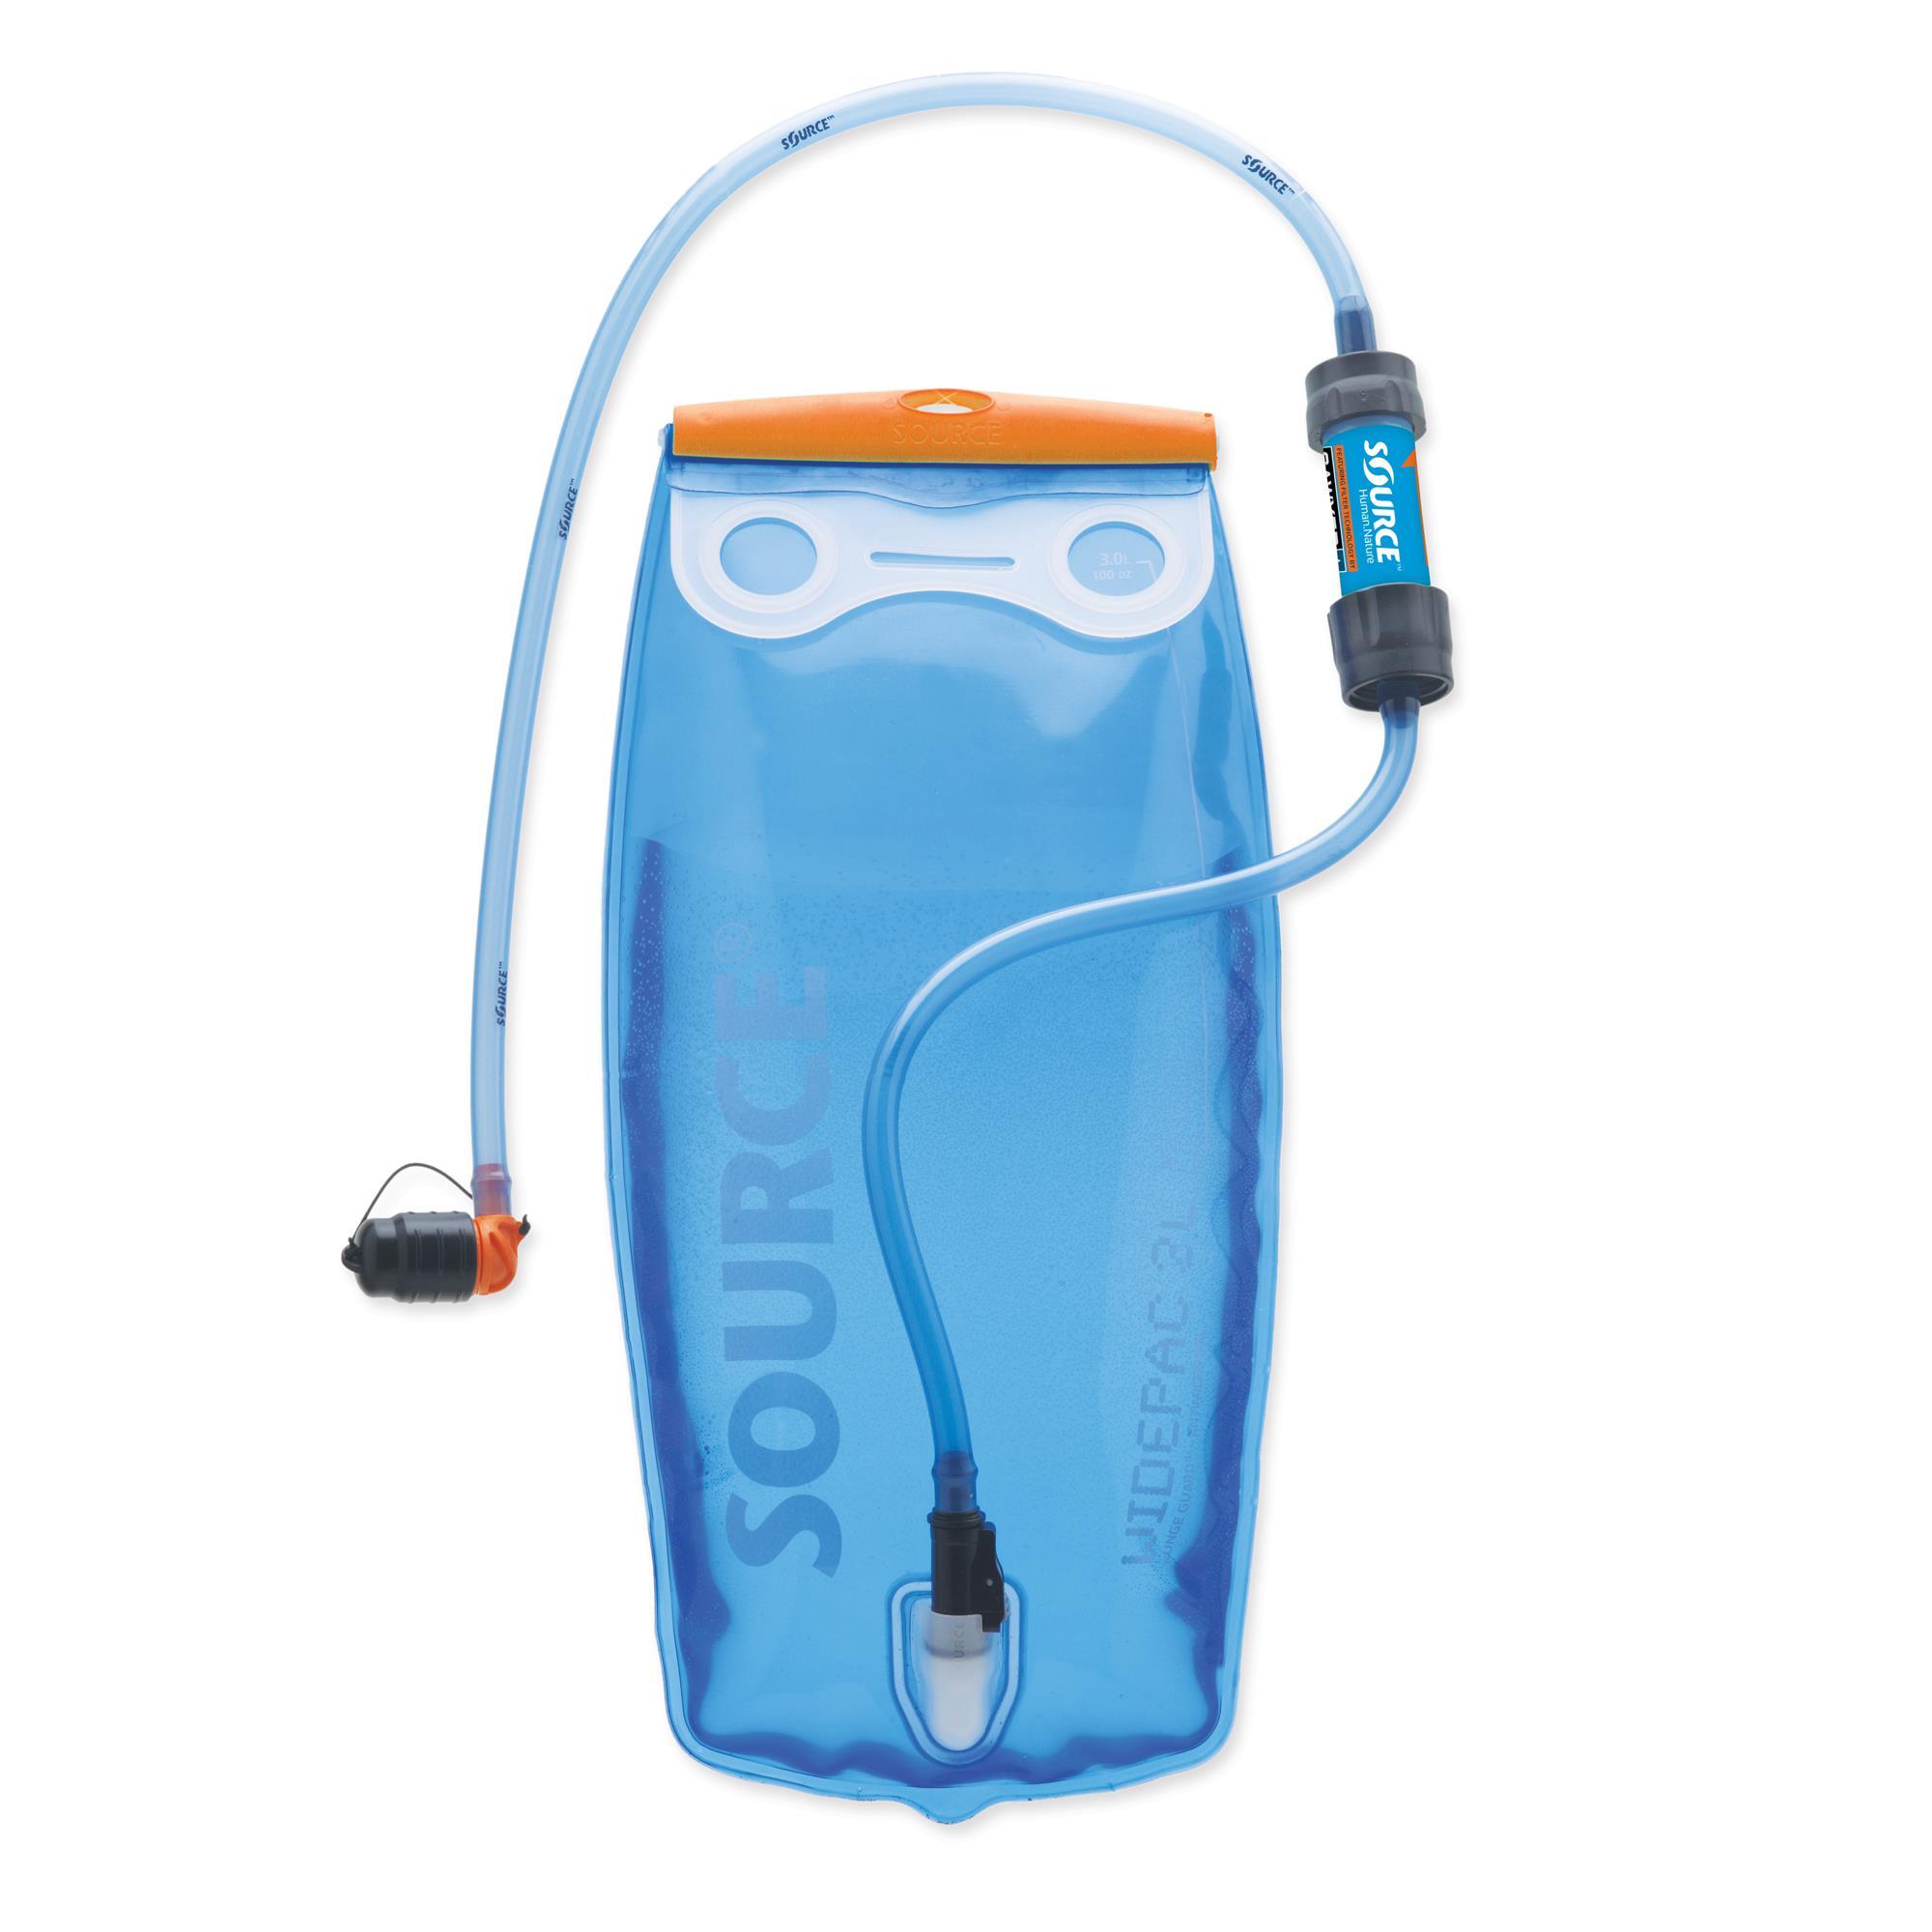 Source Widepac 2 L + Sawyer Filter Wasserfiltersystem transparent-blue